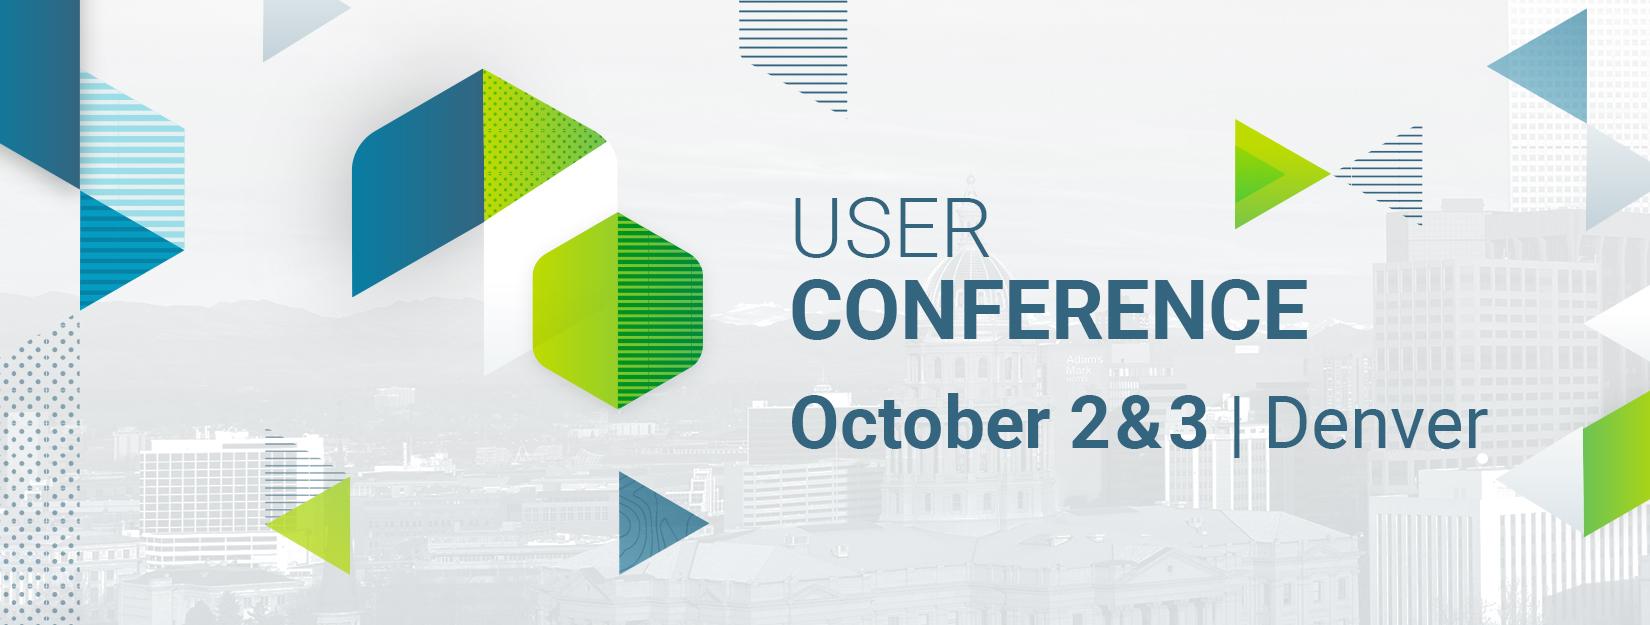 PIX4D announces first user conference in Denver, Colorado